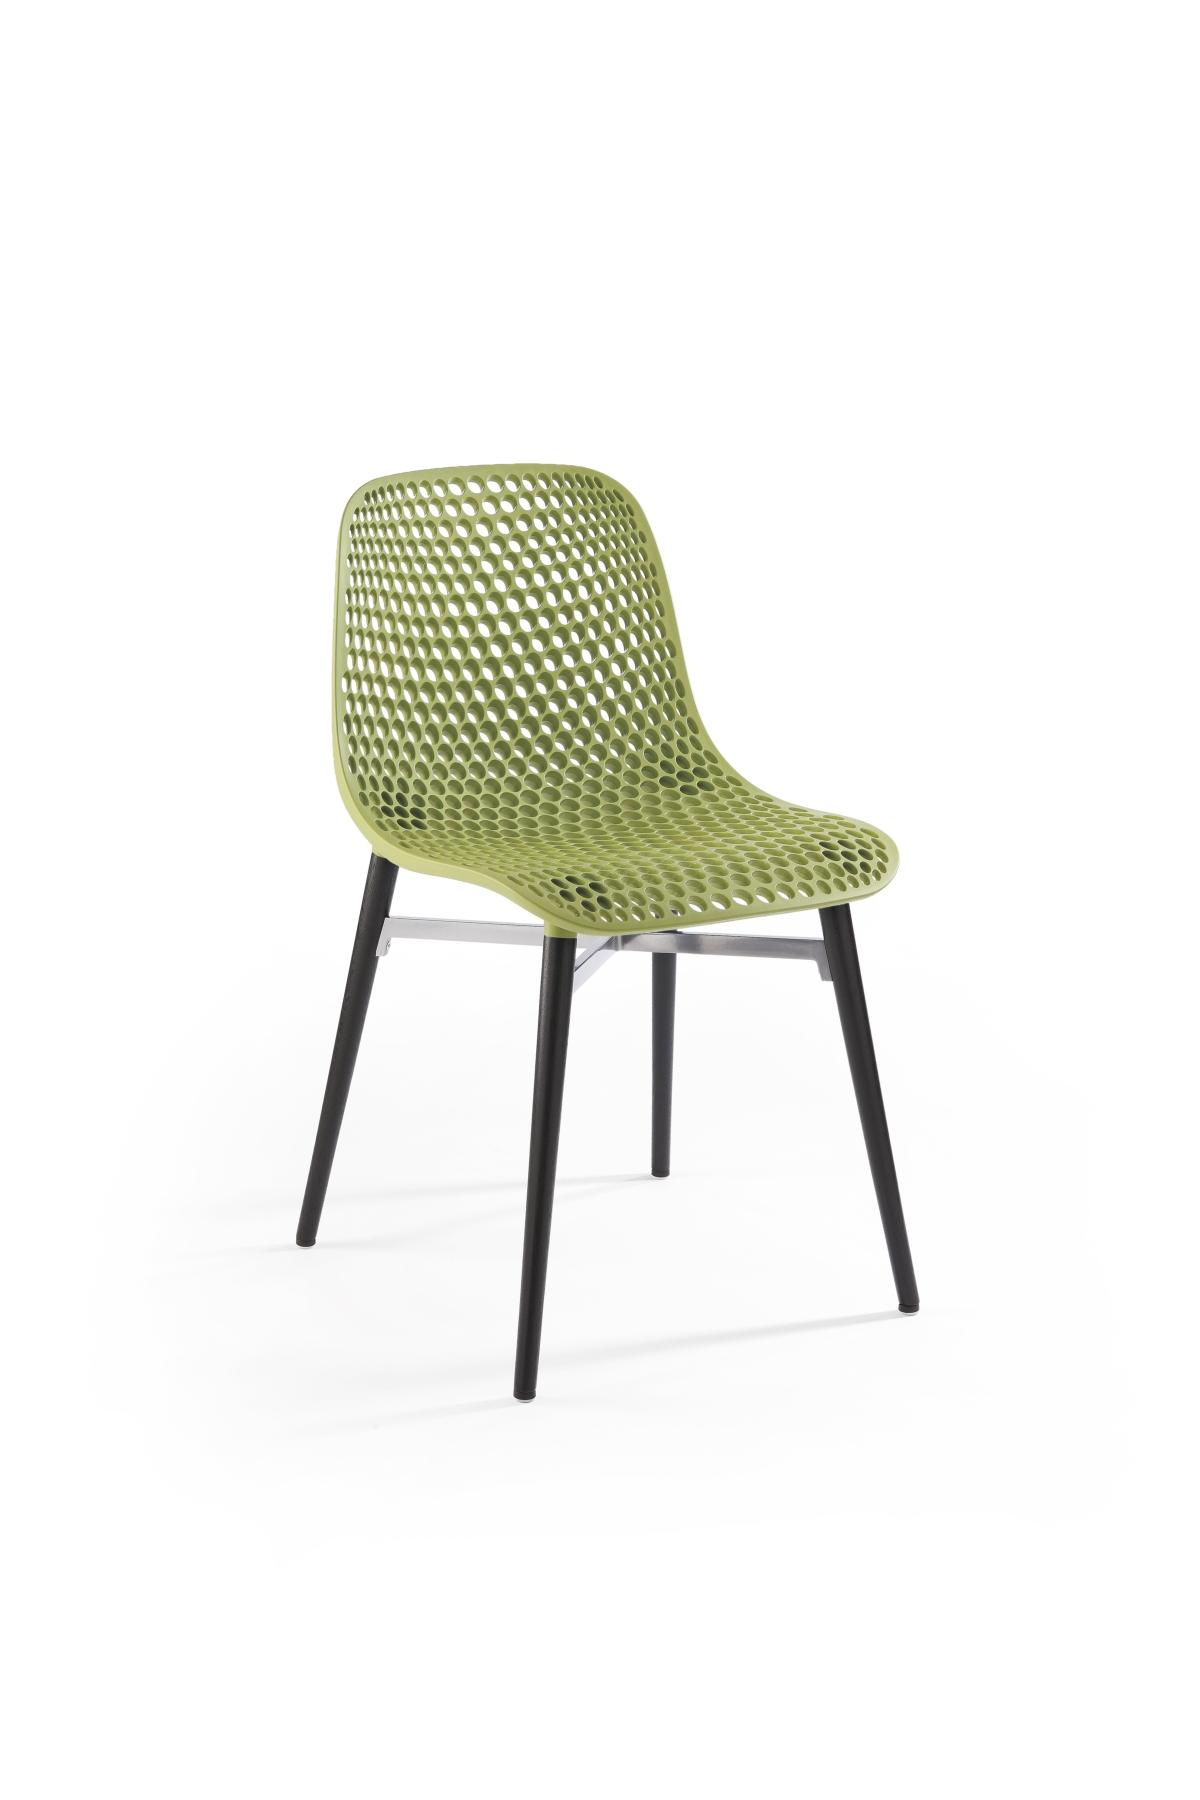 Next Chair, Infiniti Design